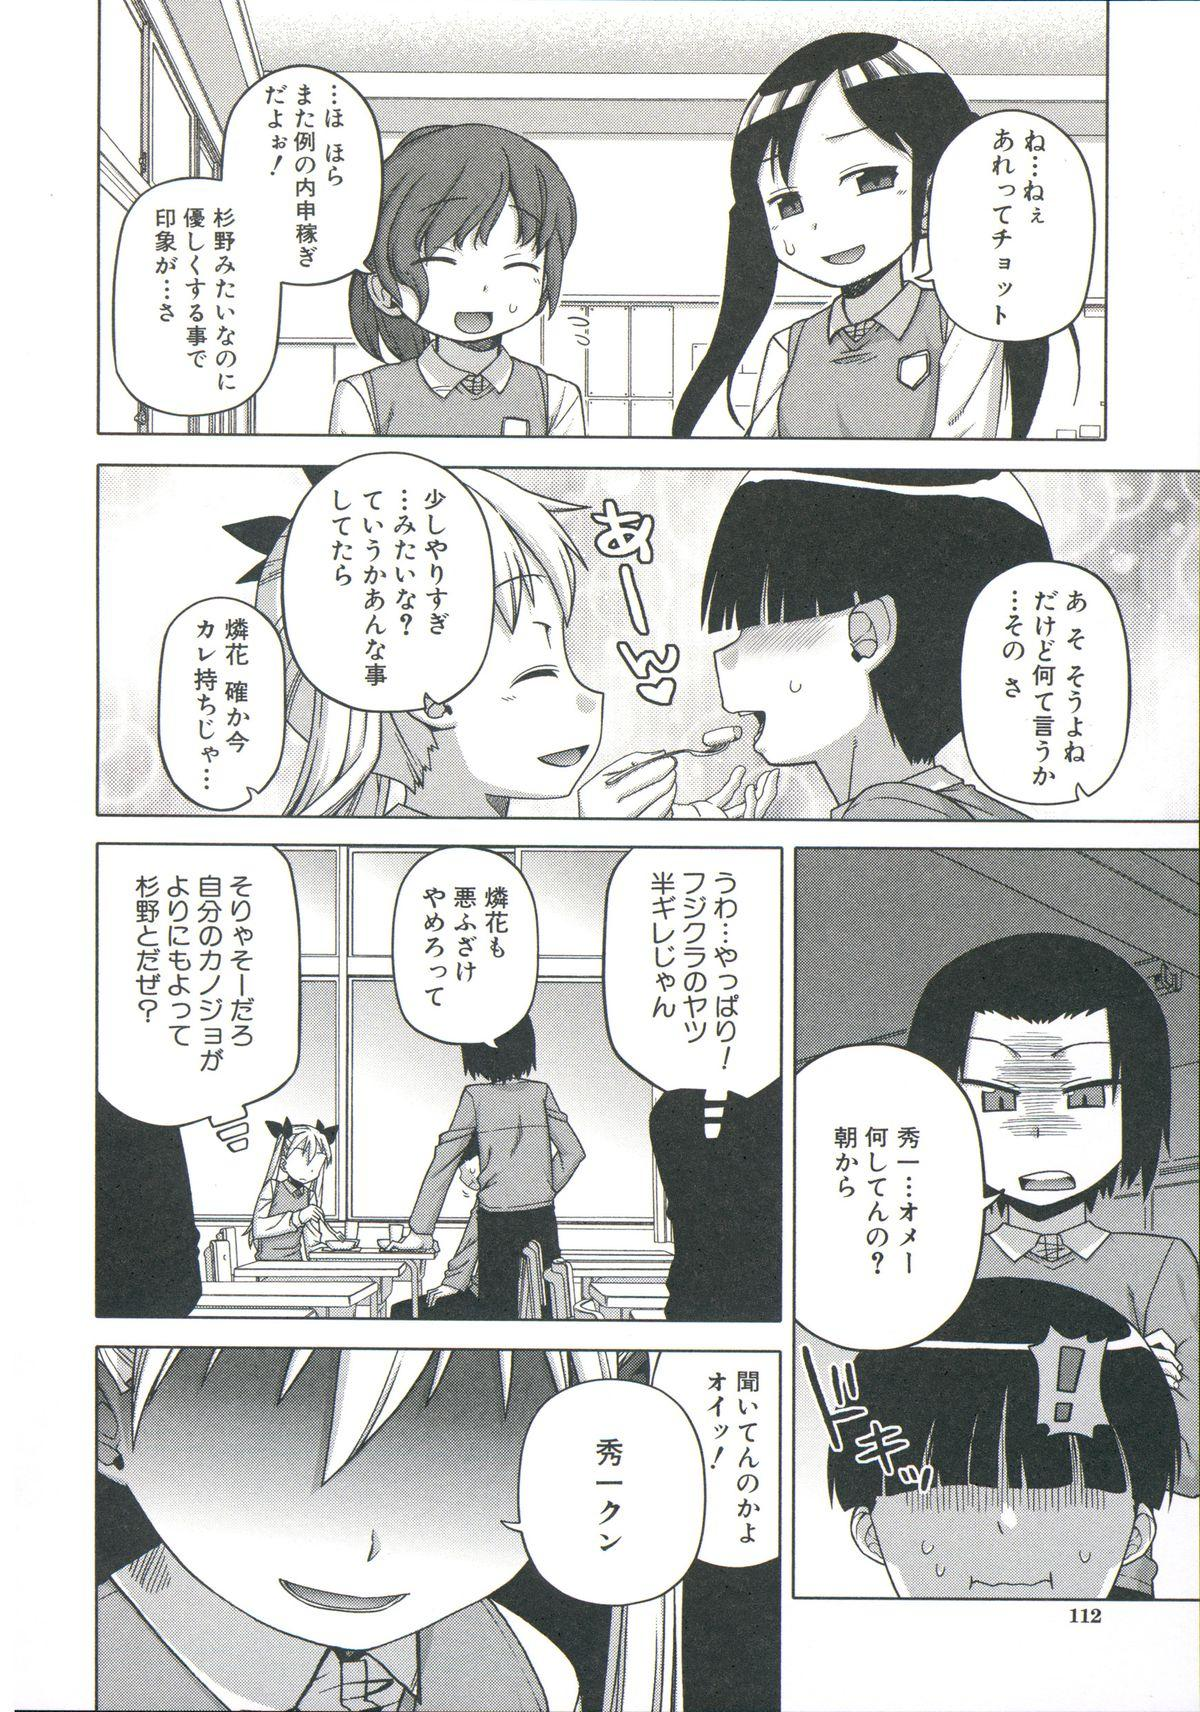 [Takatsu] Ou-sama Appli - King App 114